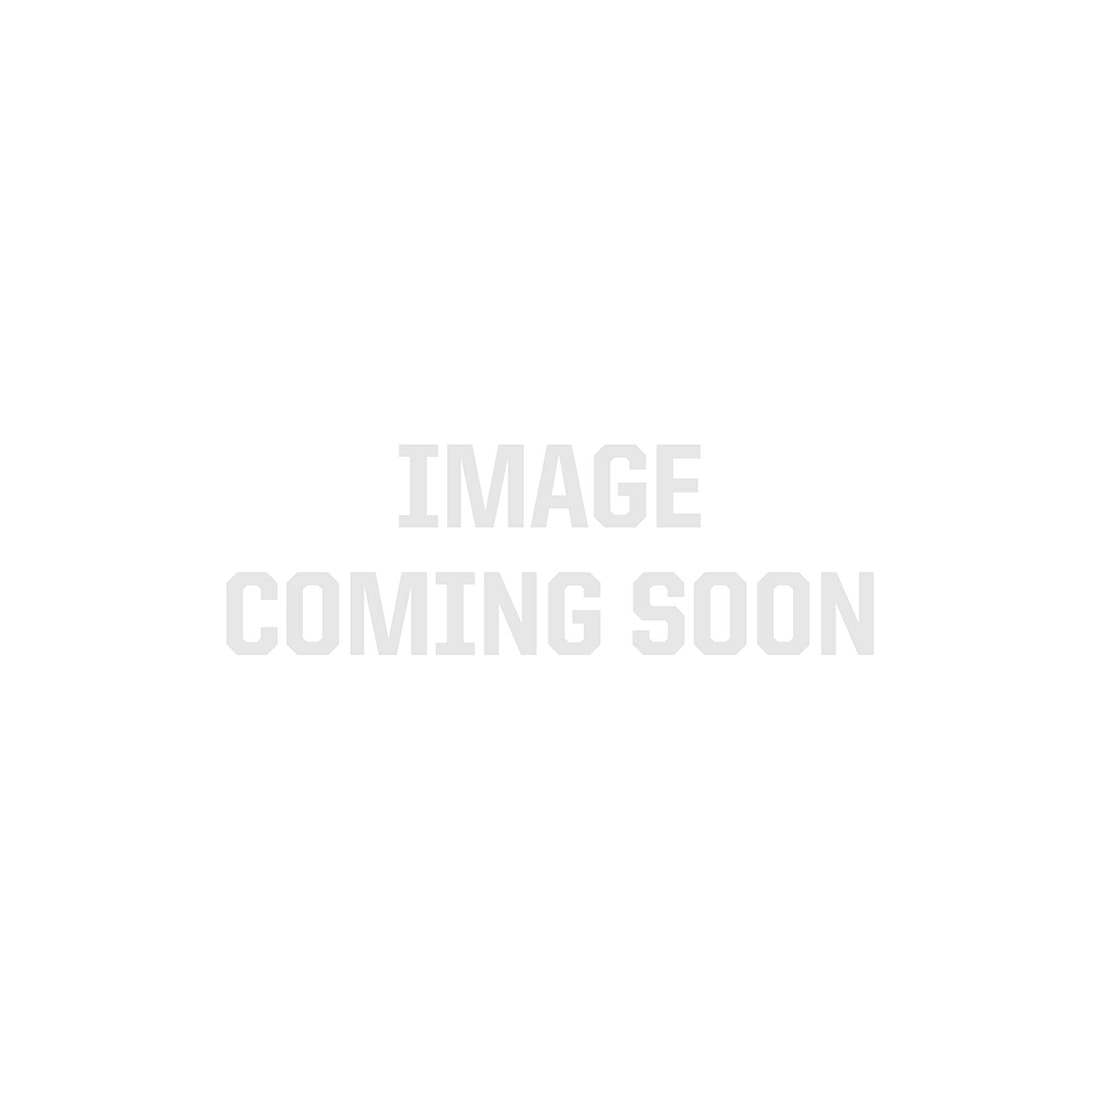 MaxRun Waterproof Neutral White 2835 Single Row CurrentControl LED Strip Light, 60/m, 10mm wide, Sample Kit